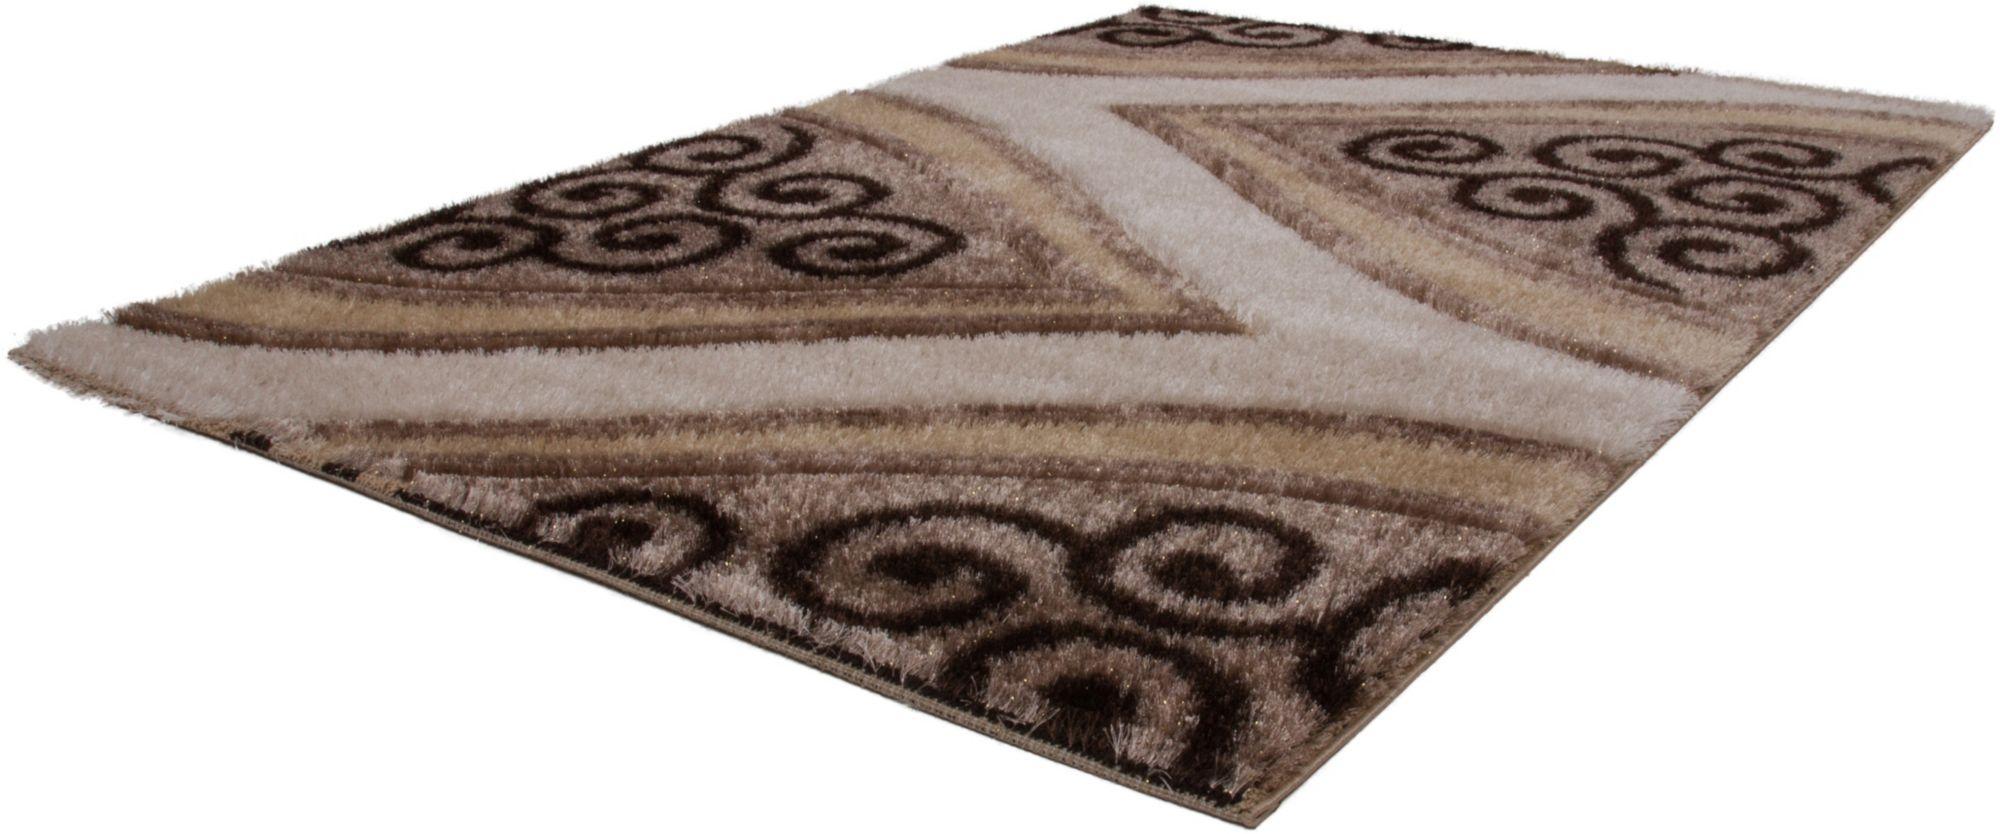 Hochflor-Teppich, »Sedef 820«, Lalee, rechteckig, Höhe 35 mm, maschinell gewebt